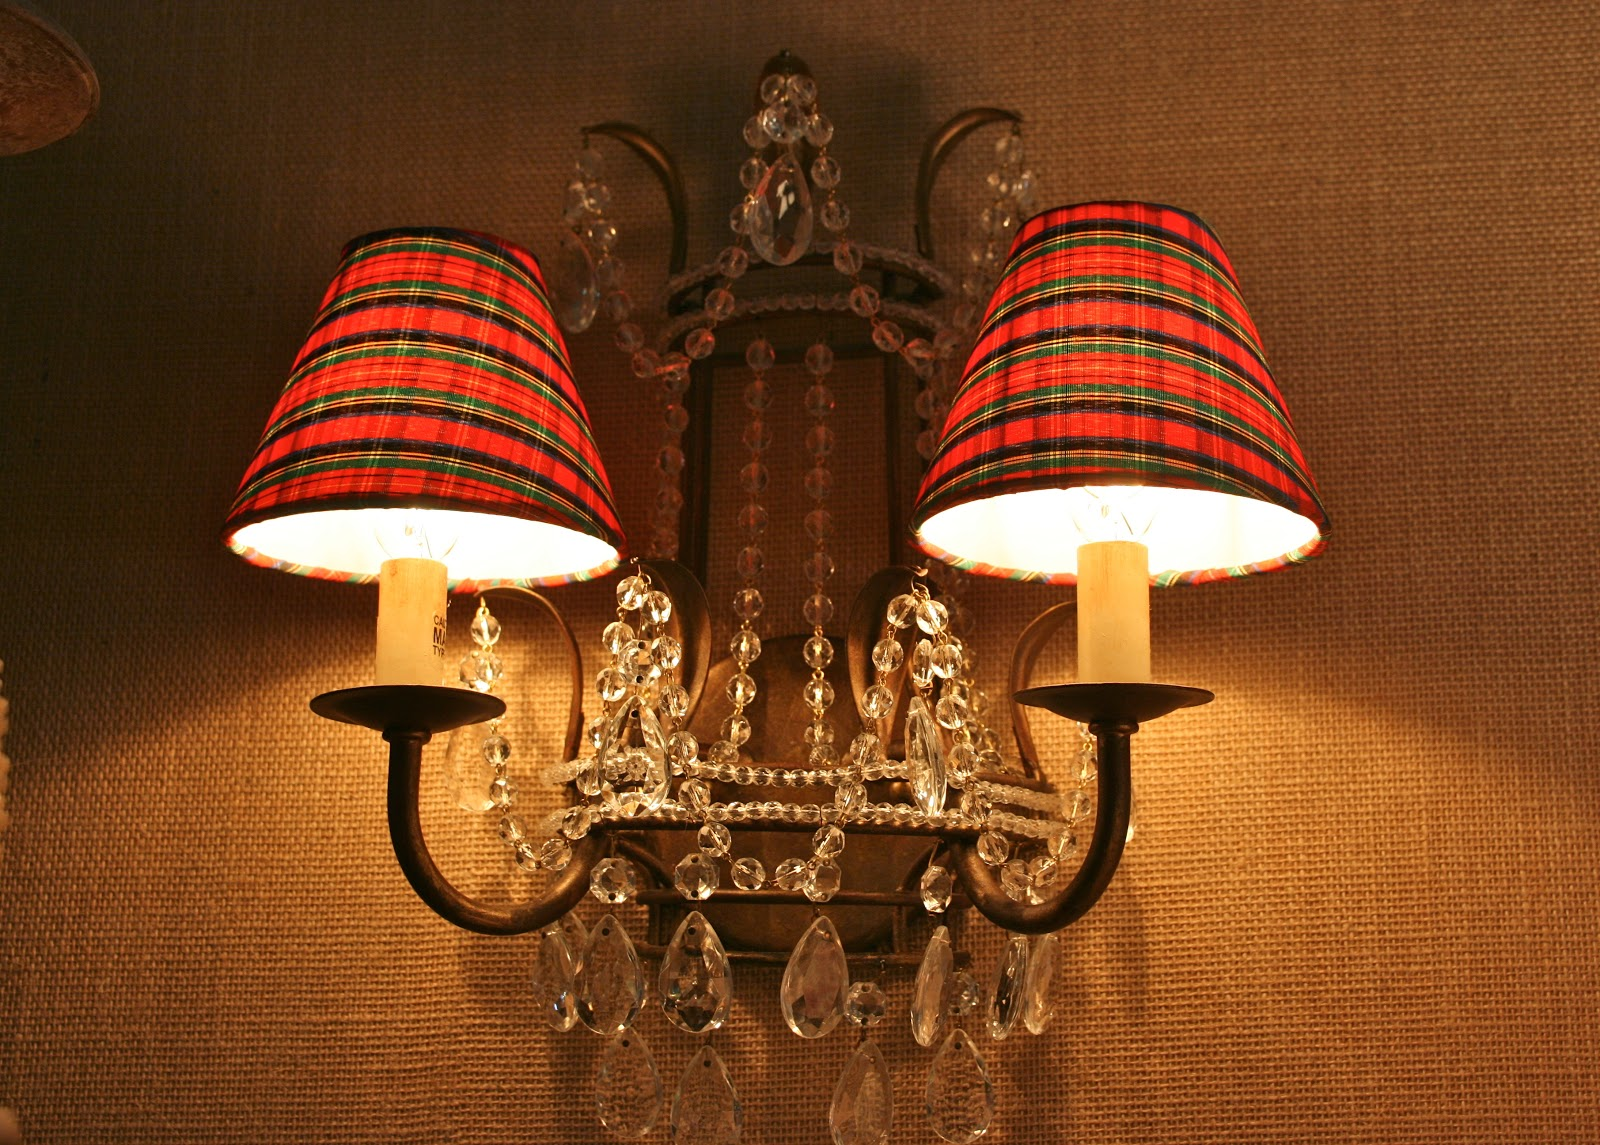 vignette design plaid the quintessential christmas pattern. Black Bedroom Furniture Sets. Home Design Ideas